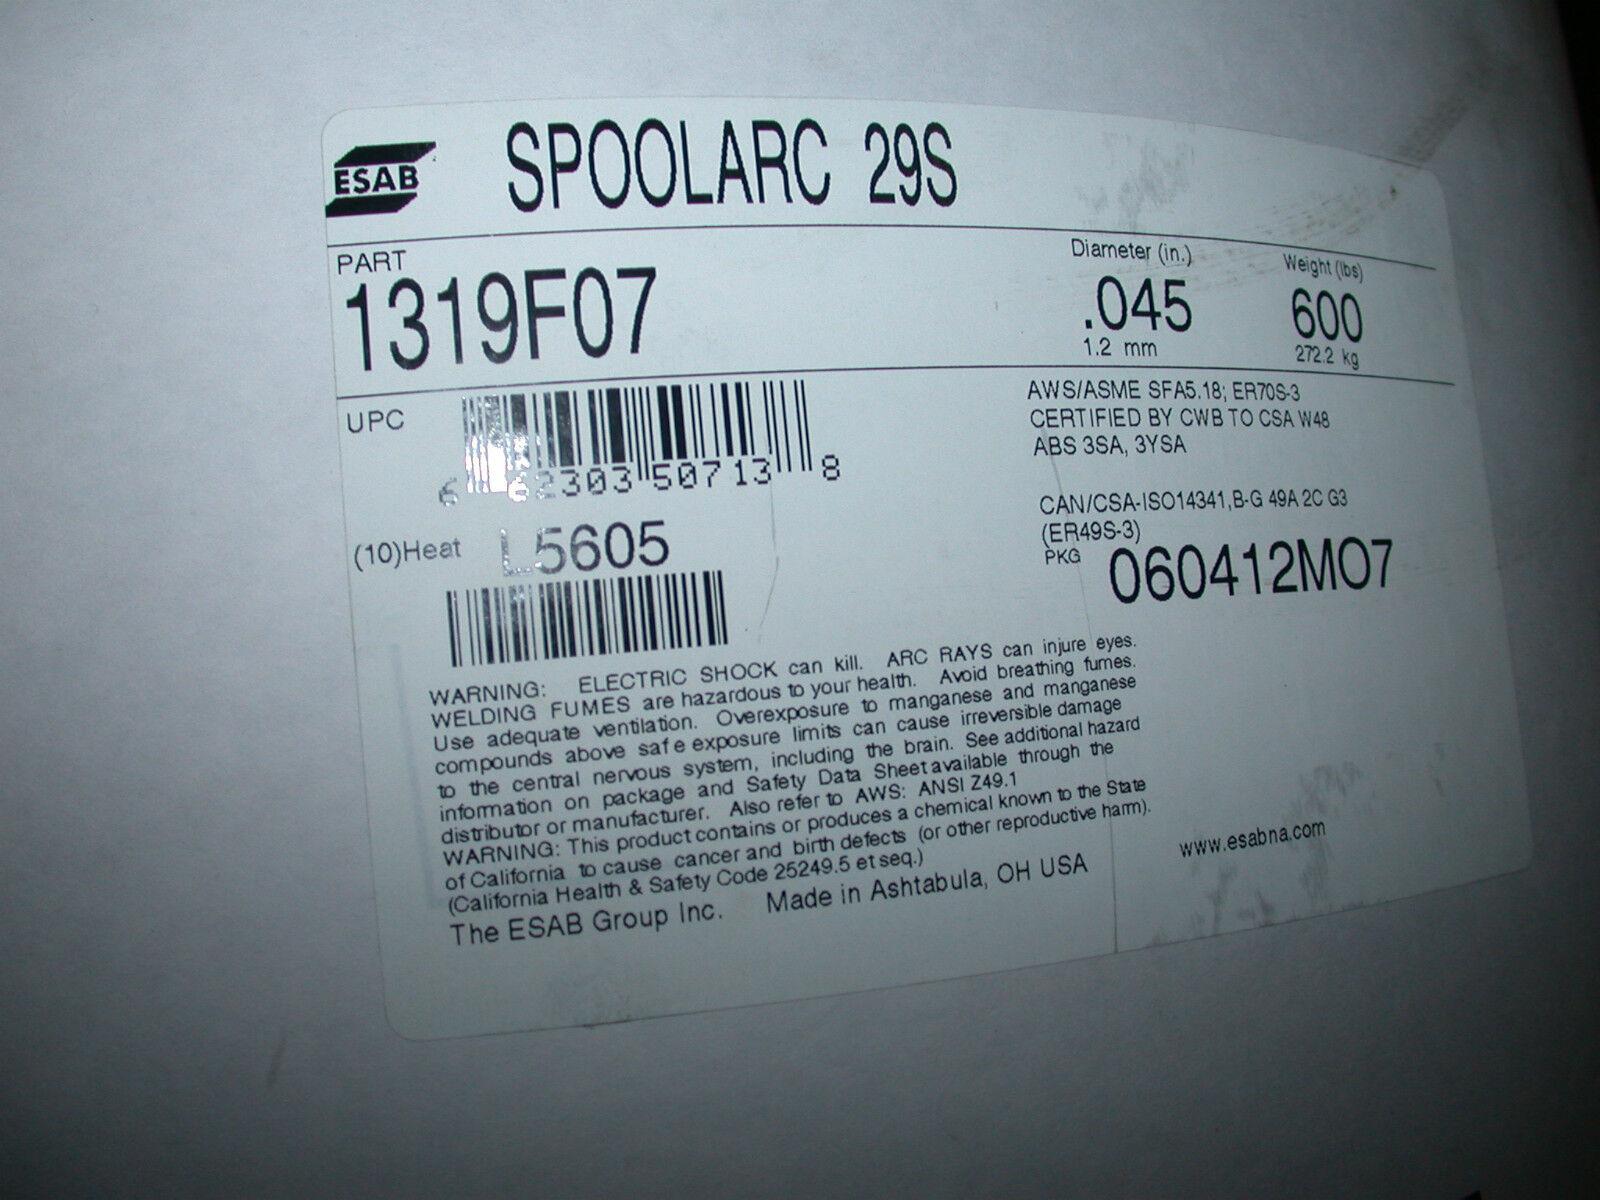 600 LB Spool of ESAB Spoolarc 29 S .045 Welding Wire 1319 F 07 | eBay